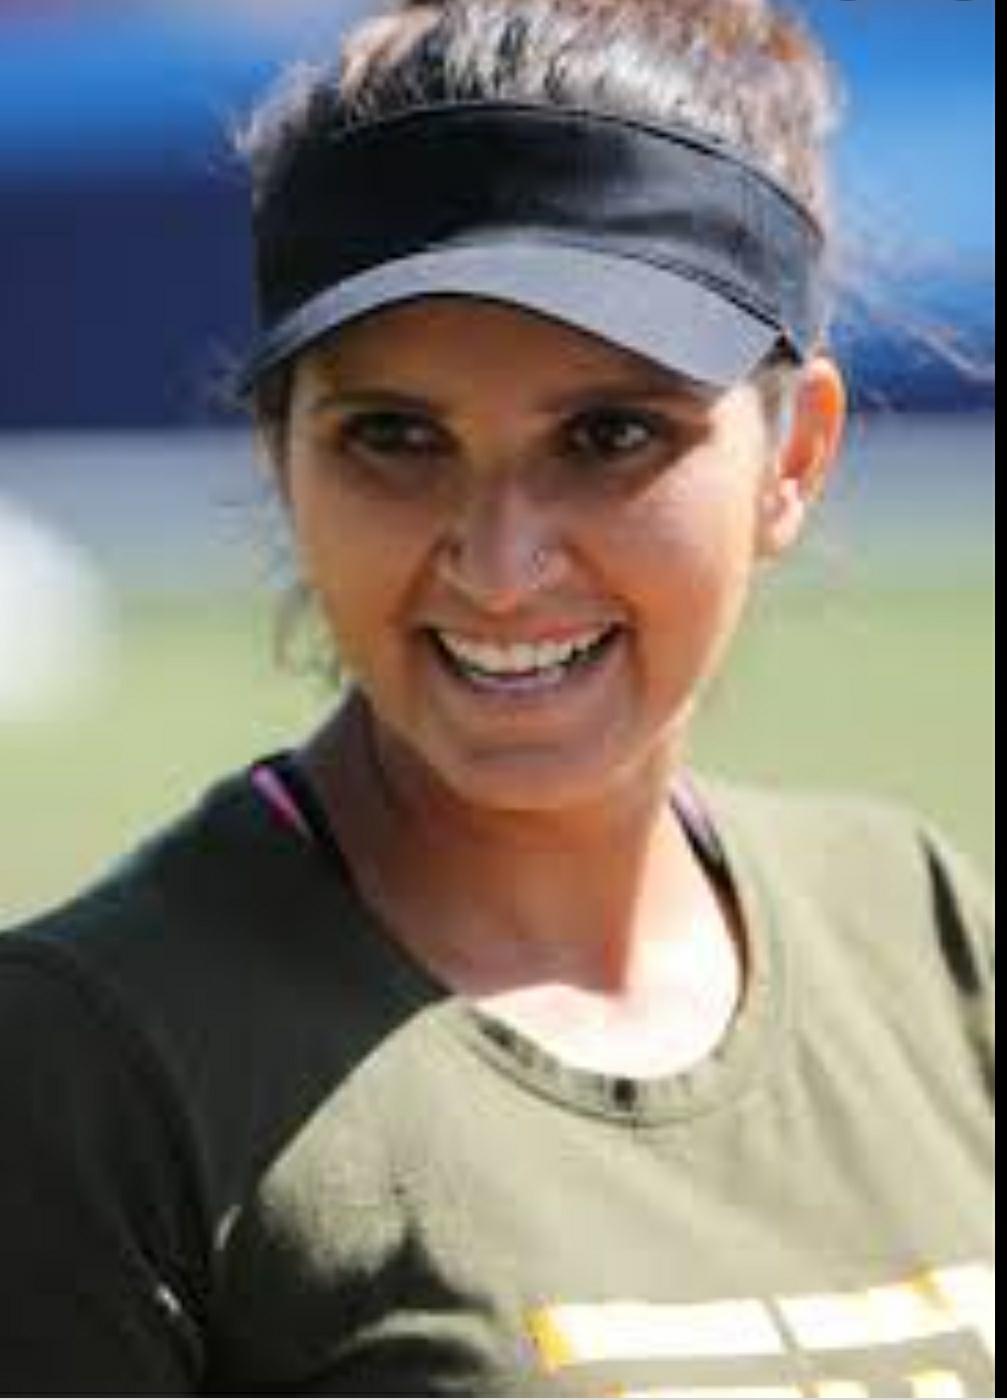 Video, ಒಲಿಂಪಿಕ್ ಕಿಟ್ ನಲ್ಲಿ ಸಾನಿಯಾ ಮಿರ್ಜಾ ಡಾನ್ಸ್ ವಿಡಿಯೋ ವೈರಲ್...